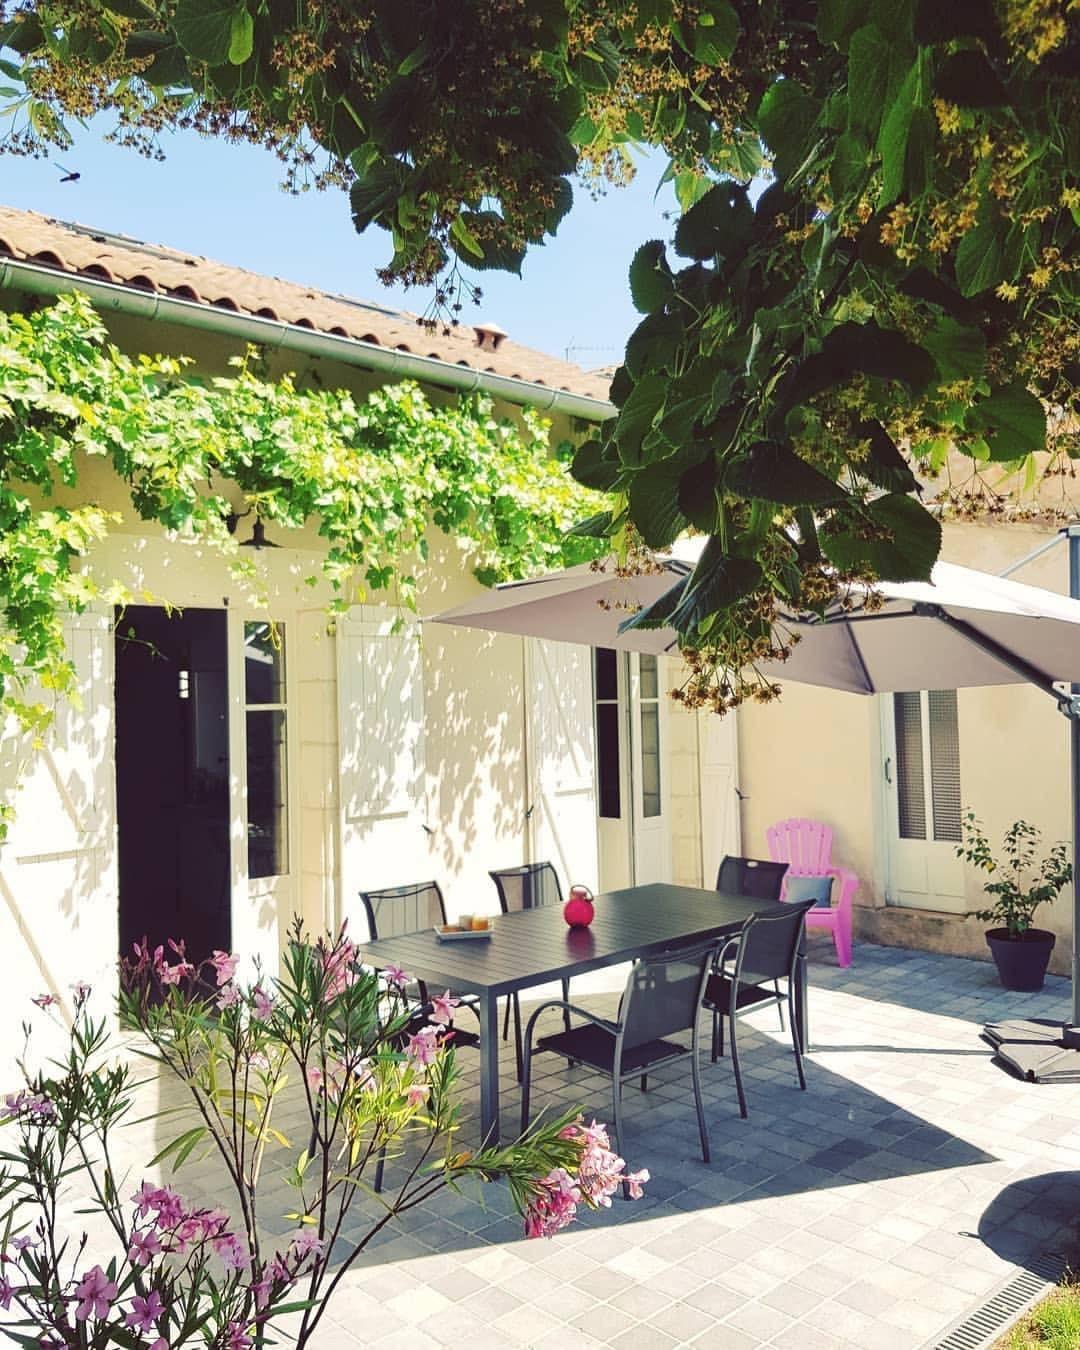 20 Favori Galerie De Foir Fouille Salon De Jardin Check More At Http Www Buypropertyspain I Outdoor Furniture Sets Outdoor Furniture Furniture Sets